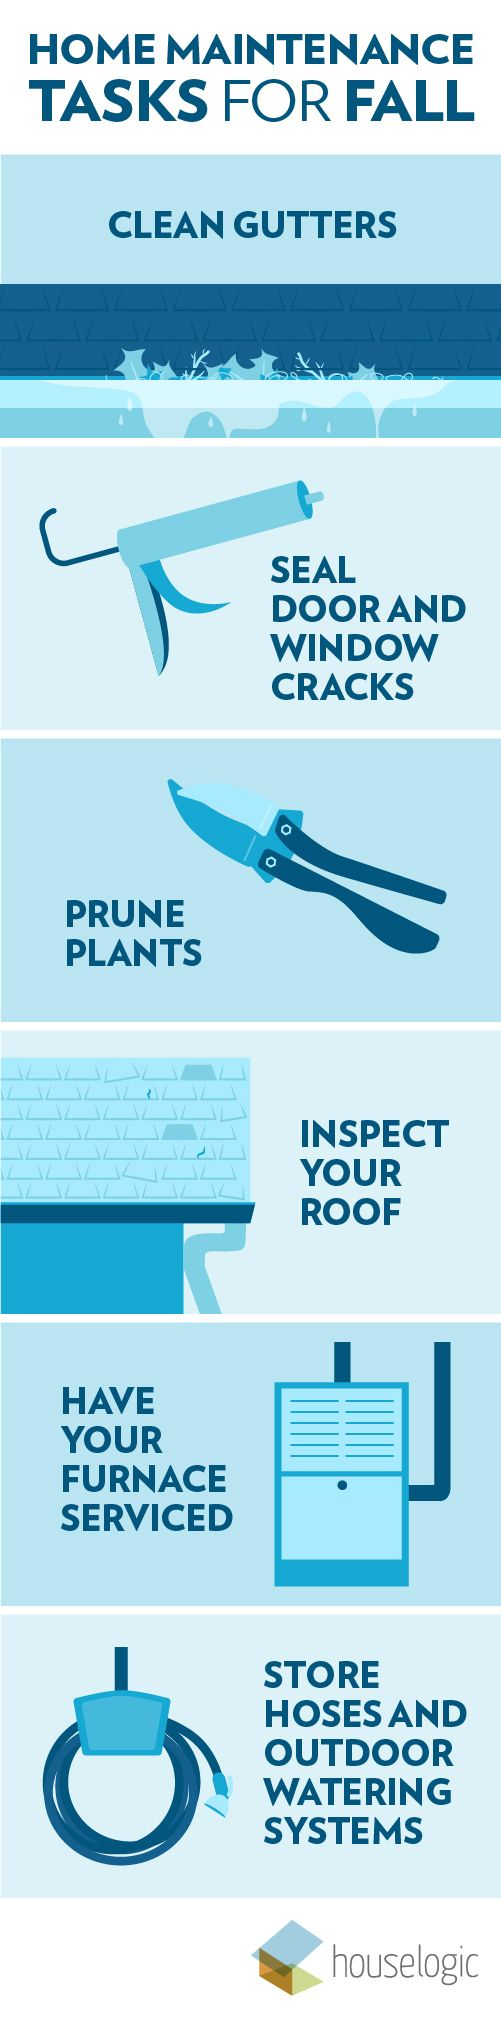 17 best ideas about home maintenance checklist on - Homedesignlover com ...